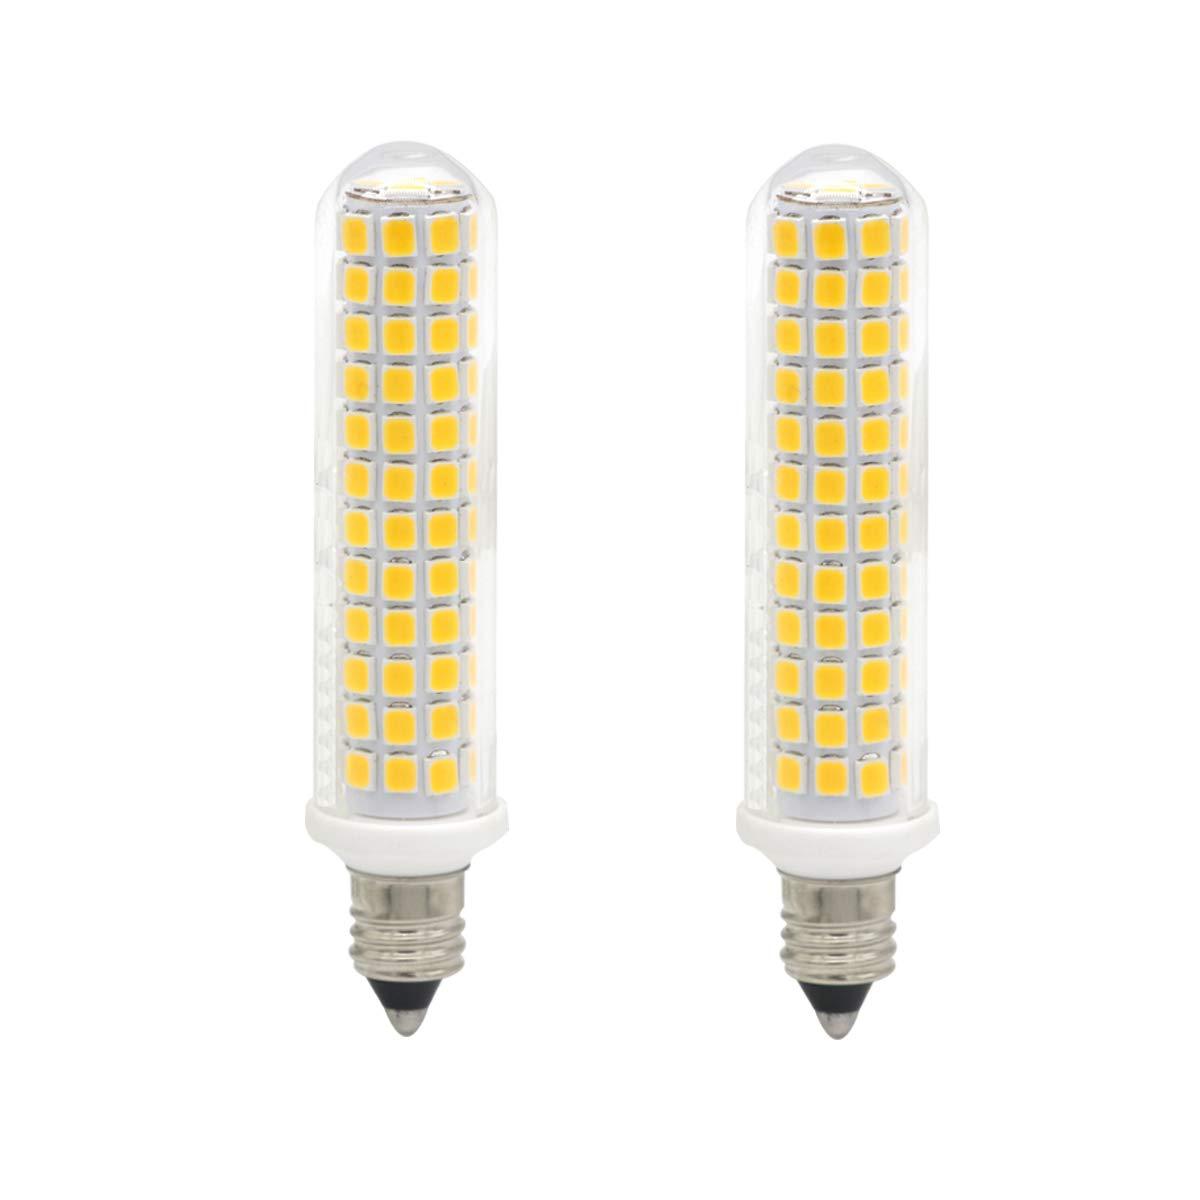 Ylaide E11 led Light Bulb 100W Halogen Bulbs Equivalent 1300lm, t4 jd e11 Mini Candelabra Base 110V 120V 130V Input 100W Halogen Replacement, Pack of 2 (Warm White 3000K)